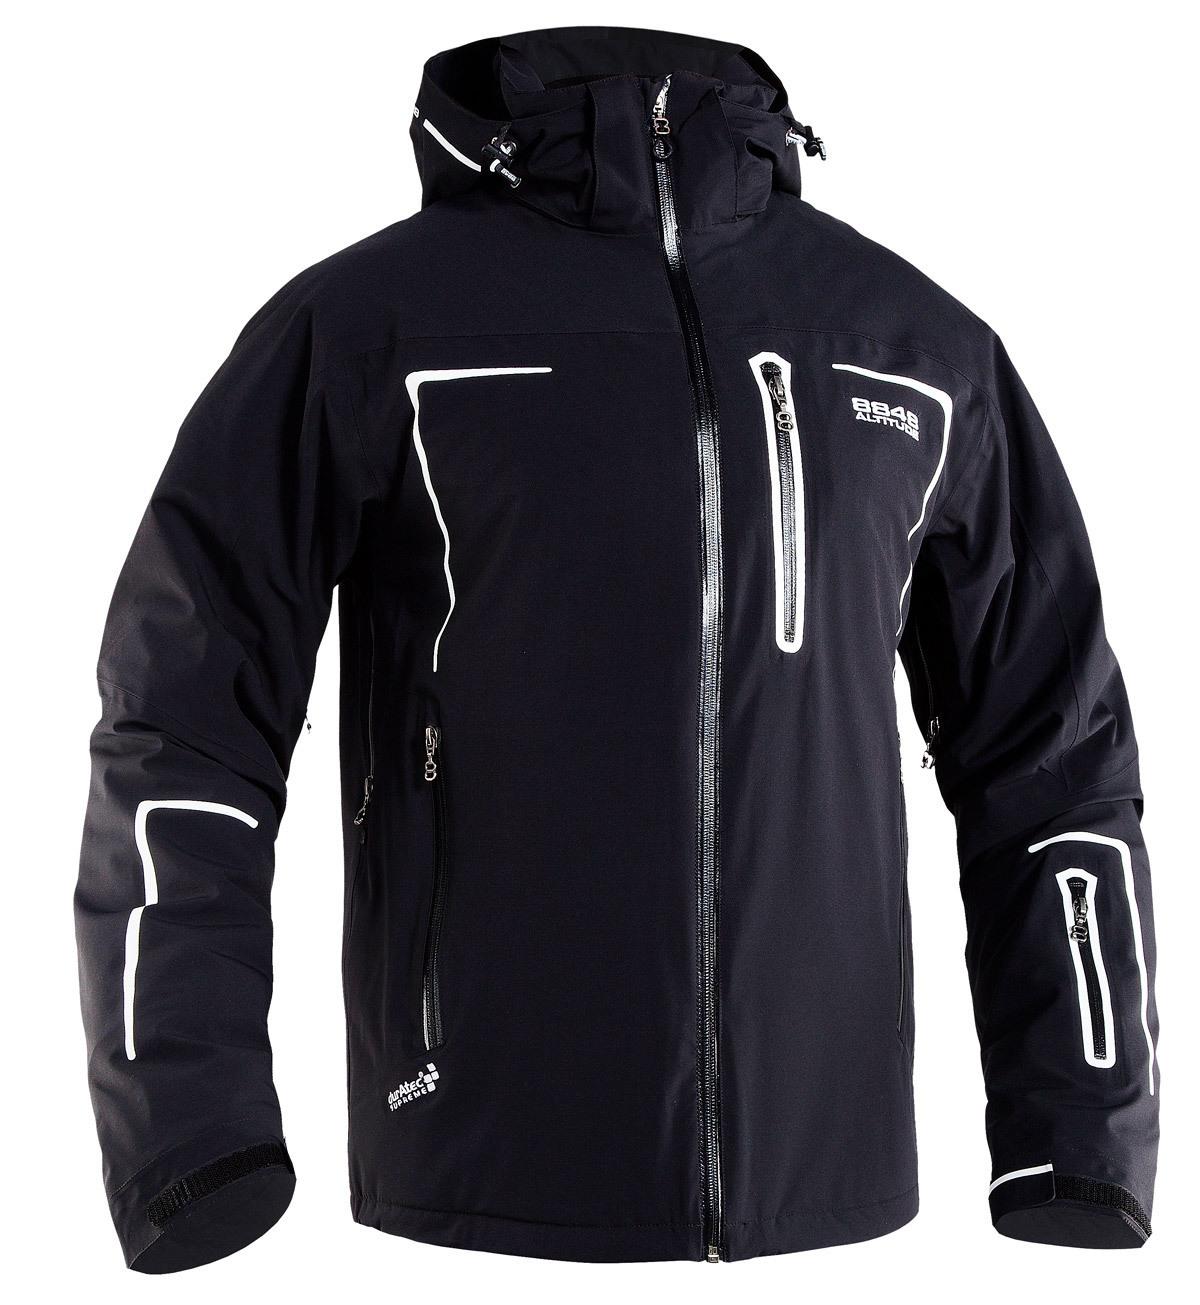 Горнолыжная куртка 8848 Altitude Vector Black